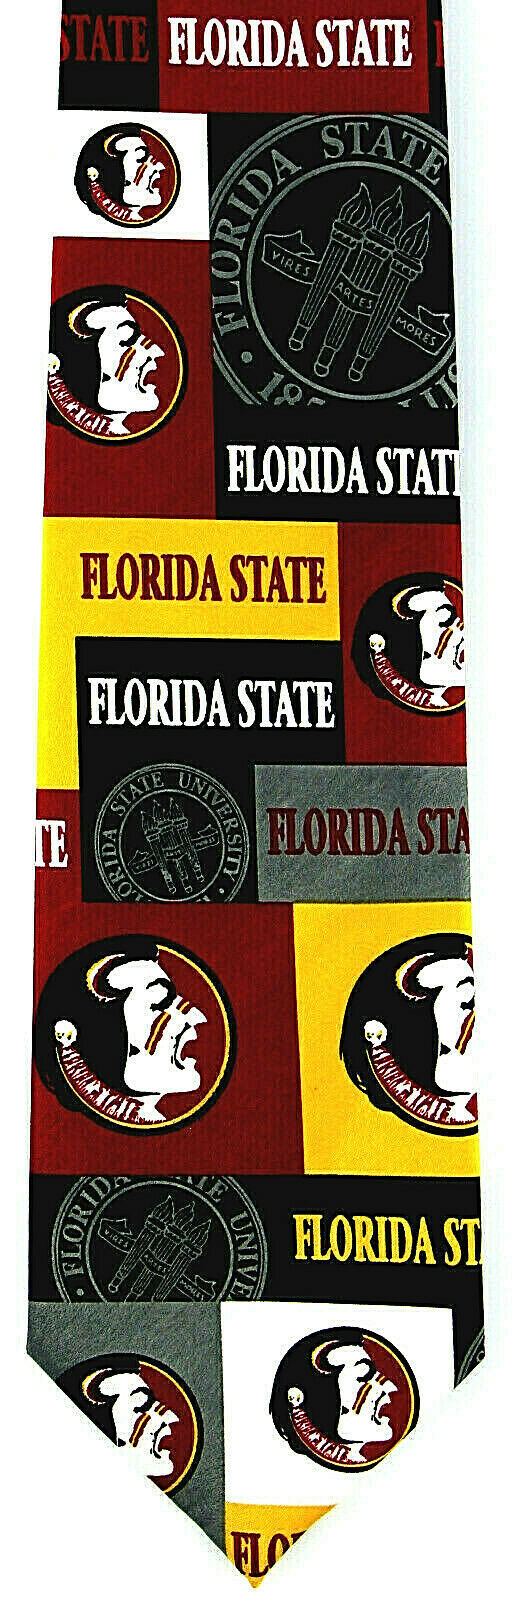 Florida State Seminoles Men's Licensed Necktie College University Red Neck Tie